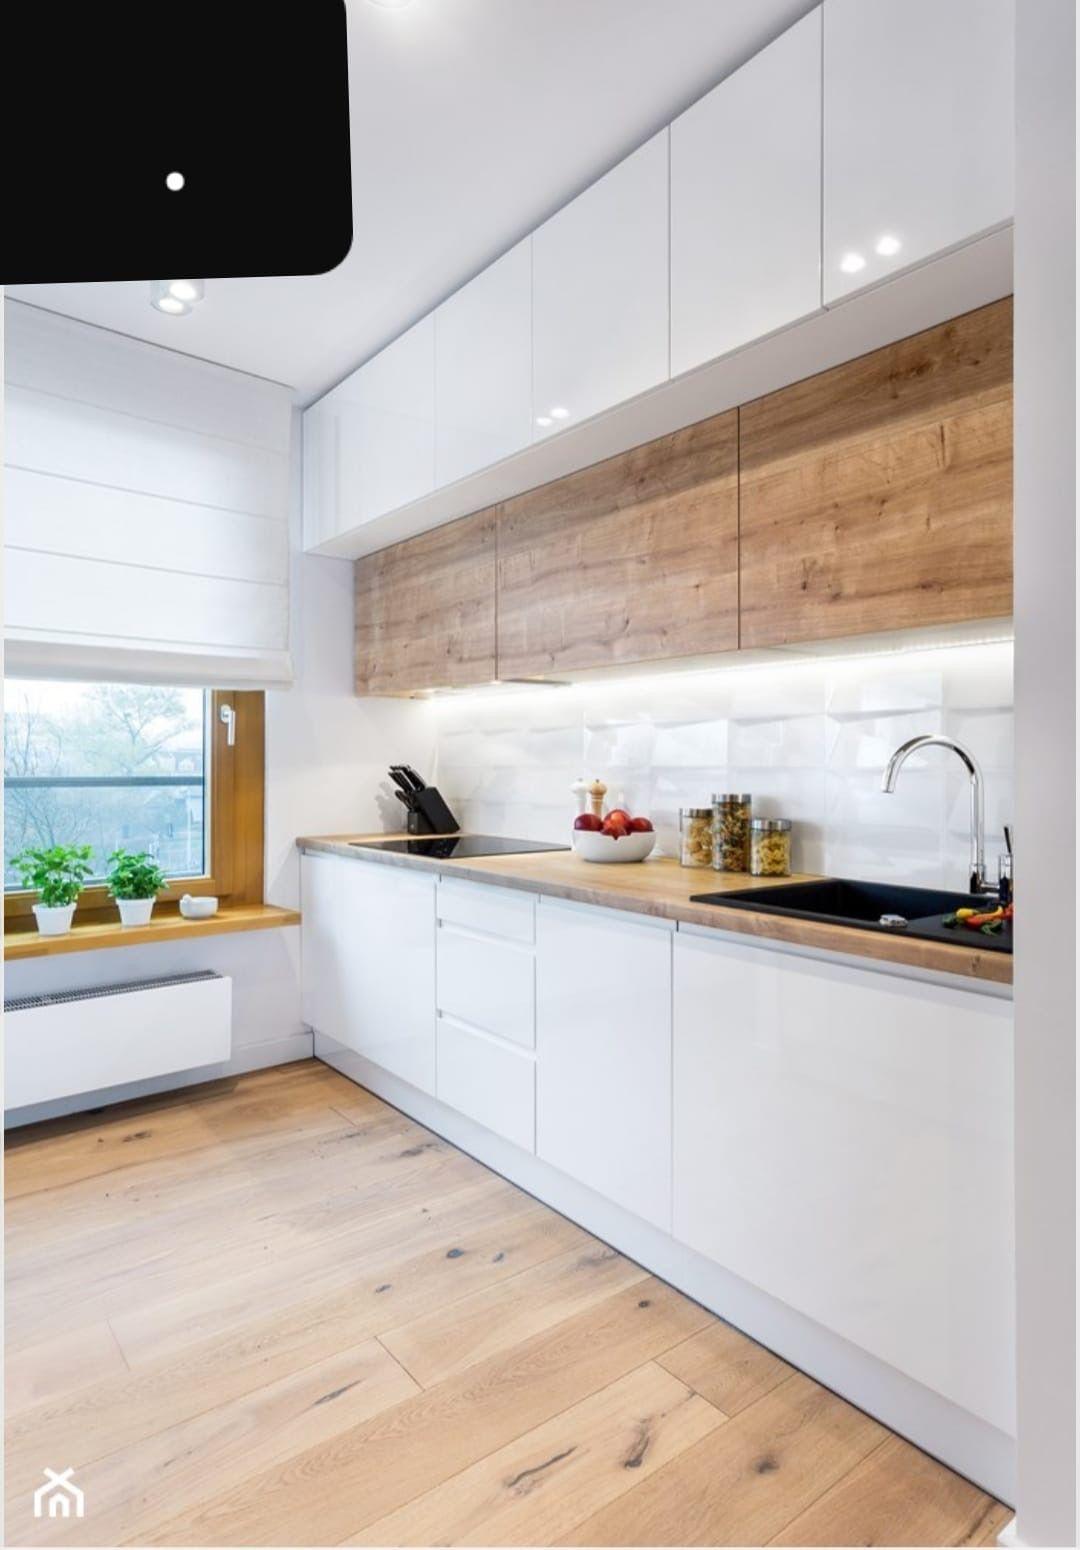 Pin By Rafal Pluskota On Ideias Kitchen Renovation Kitchen Interior Kitchen Room Design